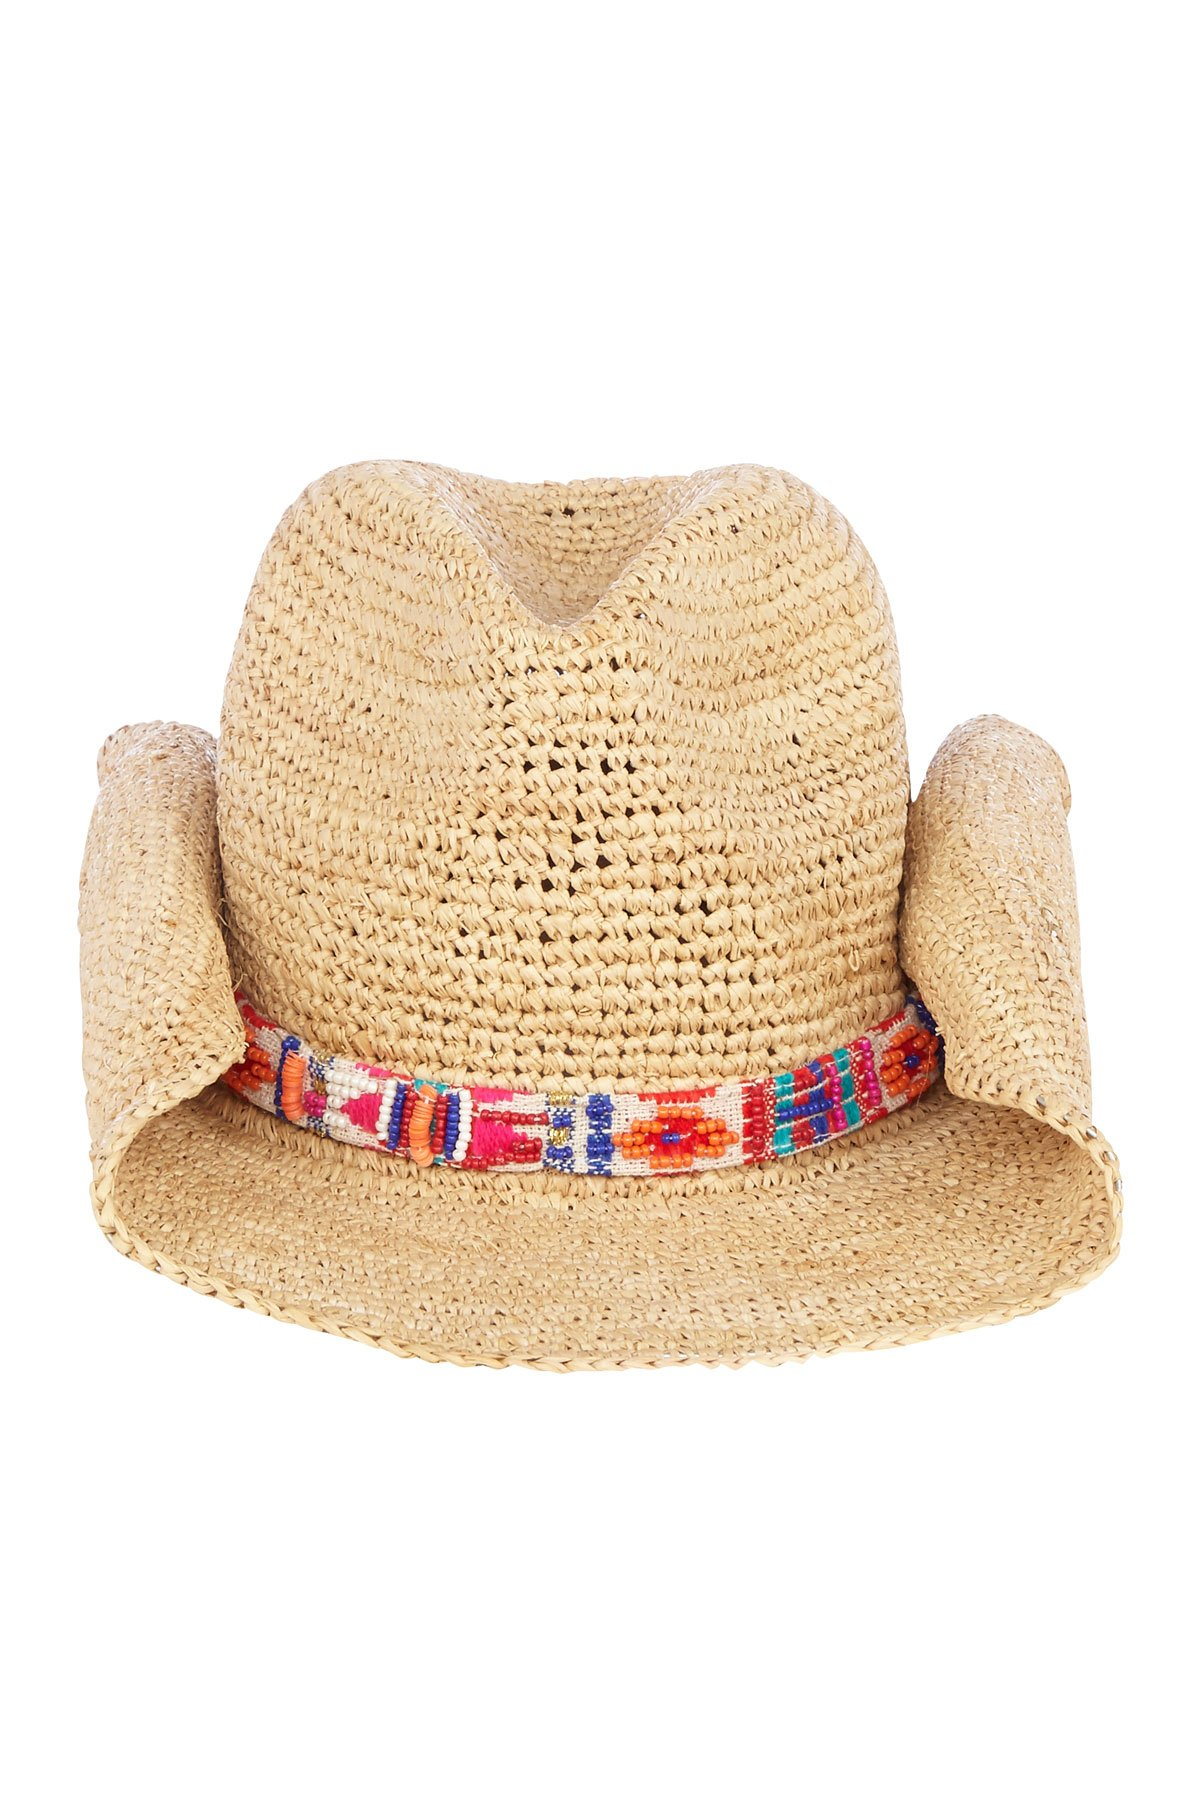 Flora Bella Florabella Women's Straw Cowboy Hat Natural/Apple One